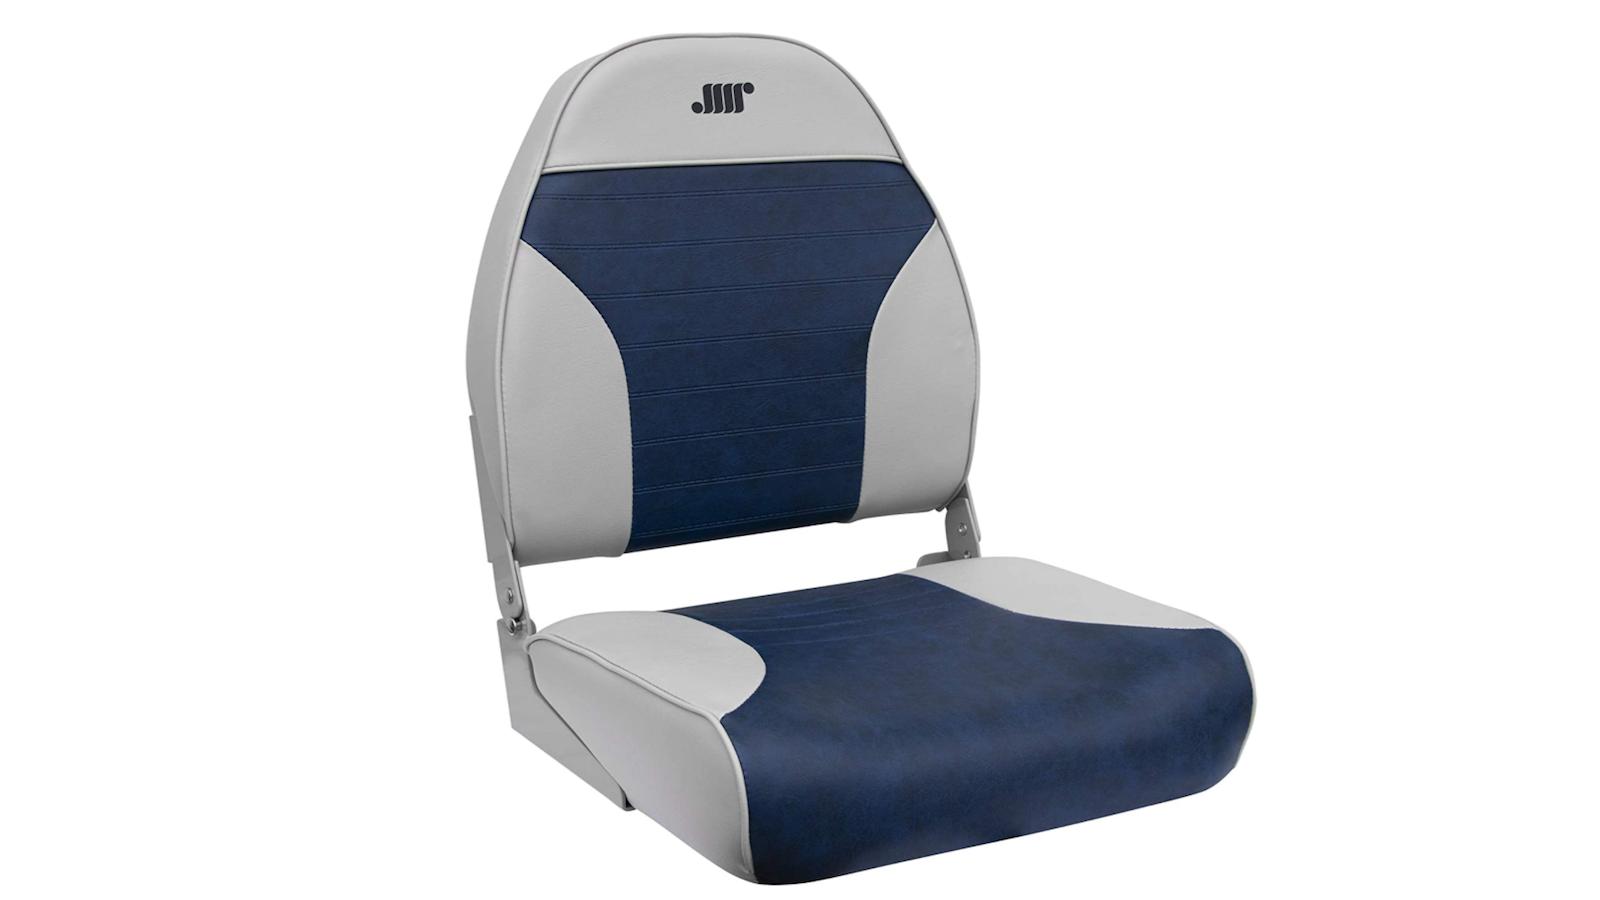 plush light gray and blue boat seat